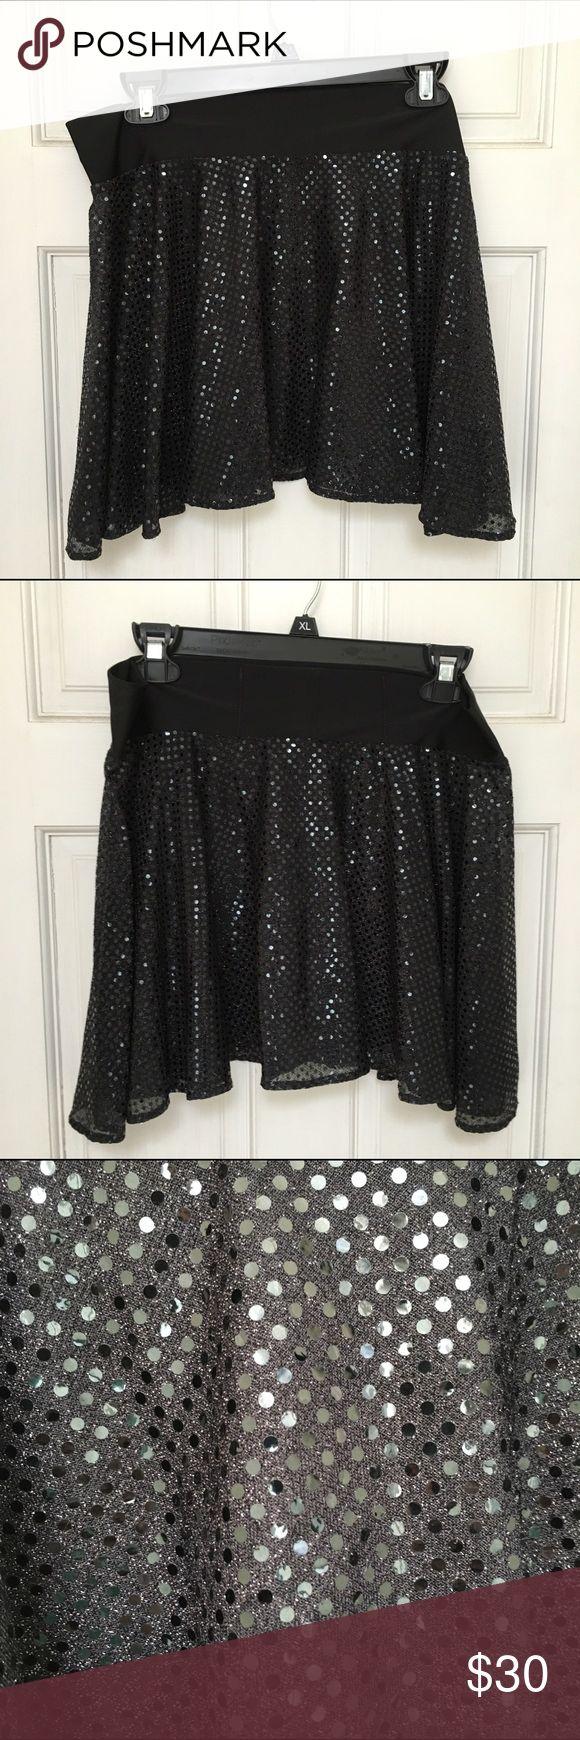 Sparkle skirt size XL. Worn once for a race. Sparkle skirt size XL. Worn once for a race.  Black sequin like fabric. Stretchy waistband. Has secret pocket inside back waistband for a key, money etc. Great to wear at a race! Sparkle Skirts Skirts Mini